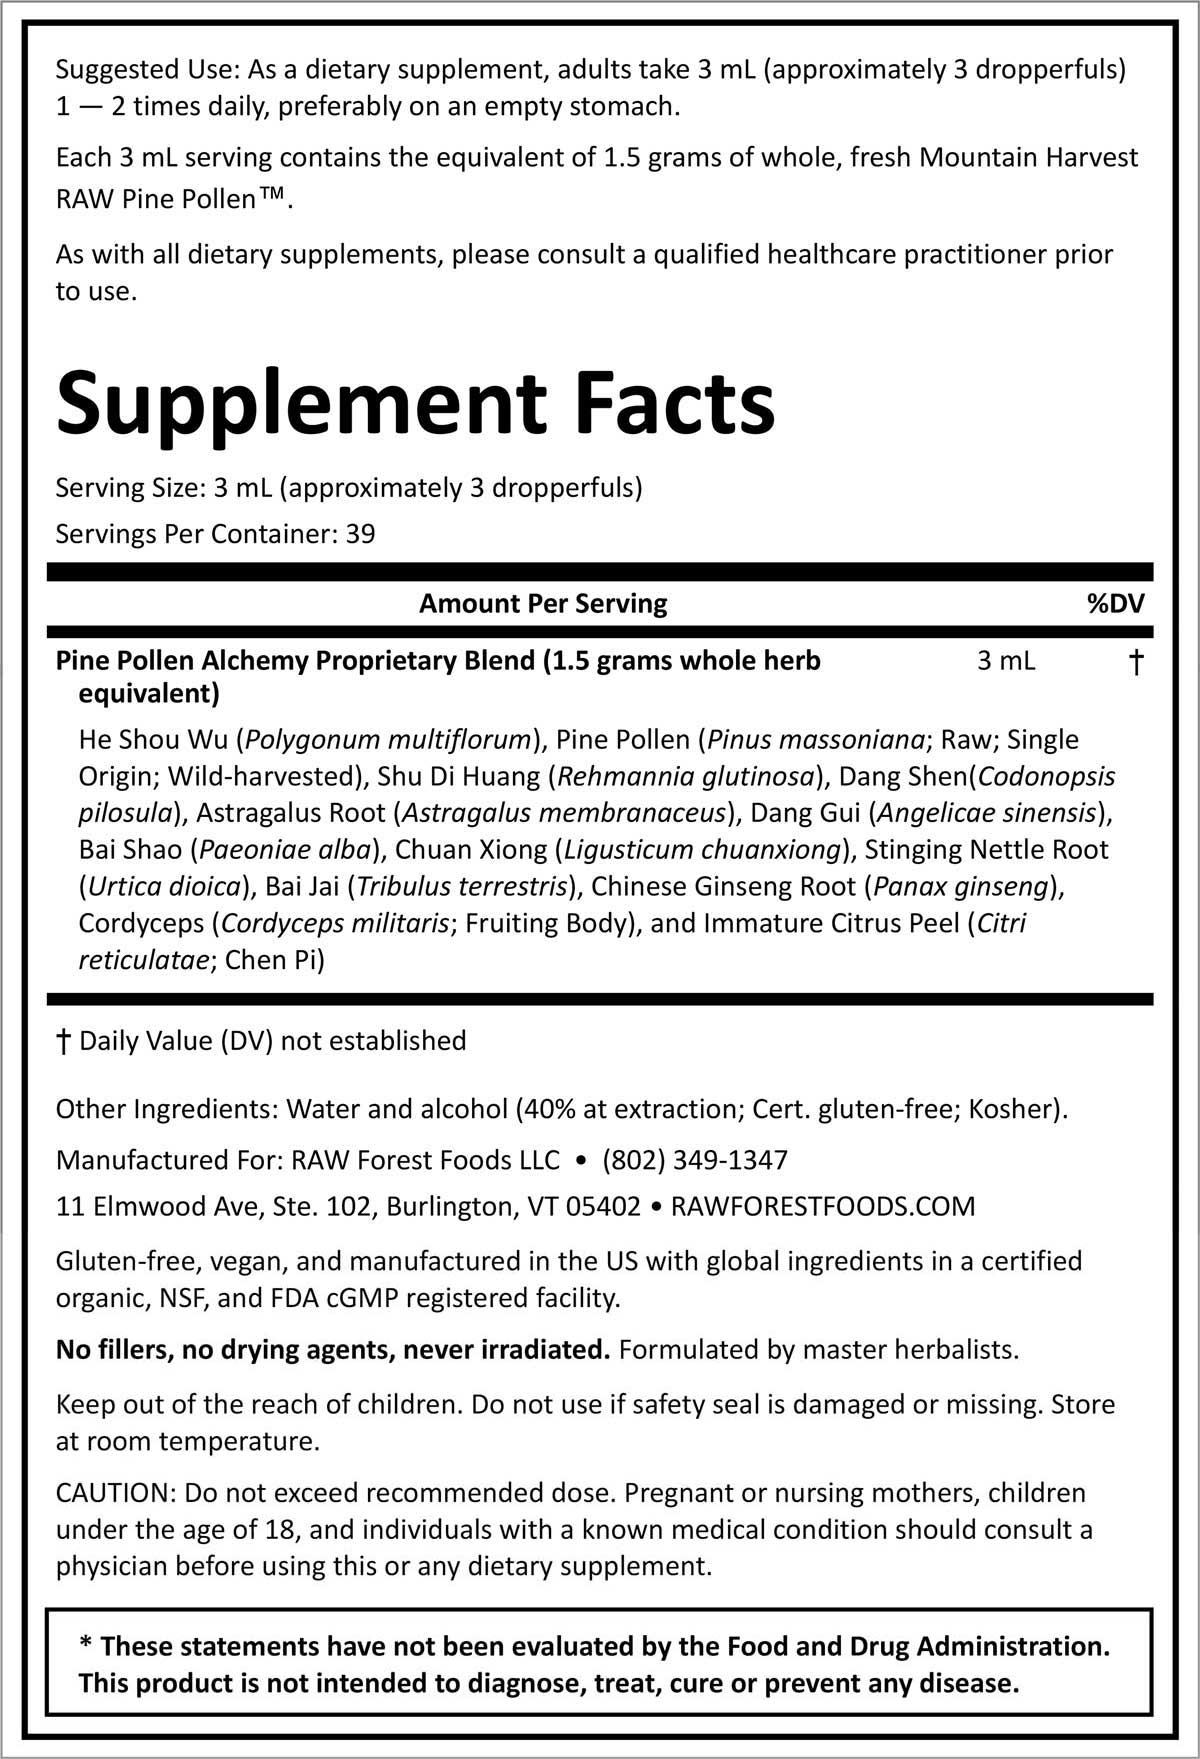 pine-pollen-alchemy-tincture-supplement-facts-4-ounce.jpg